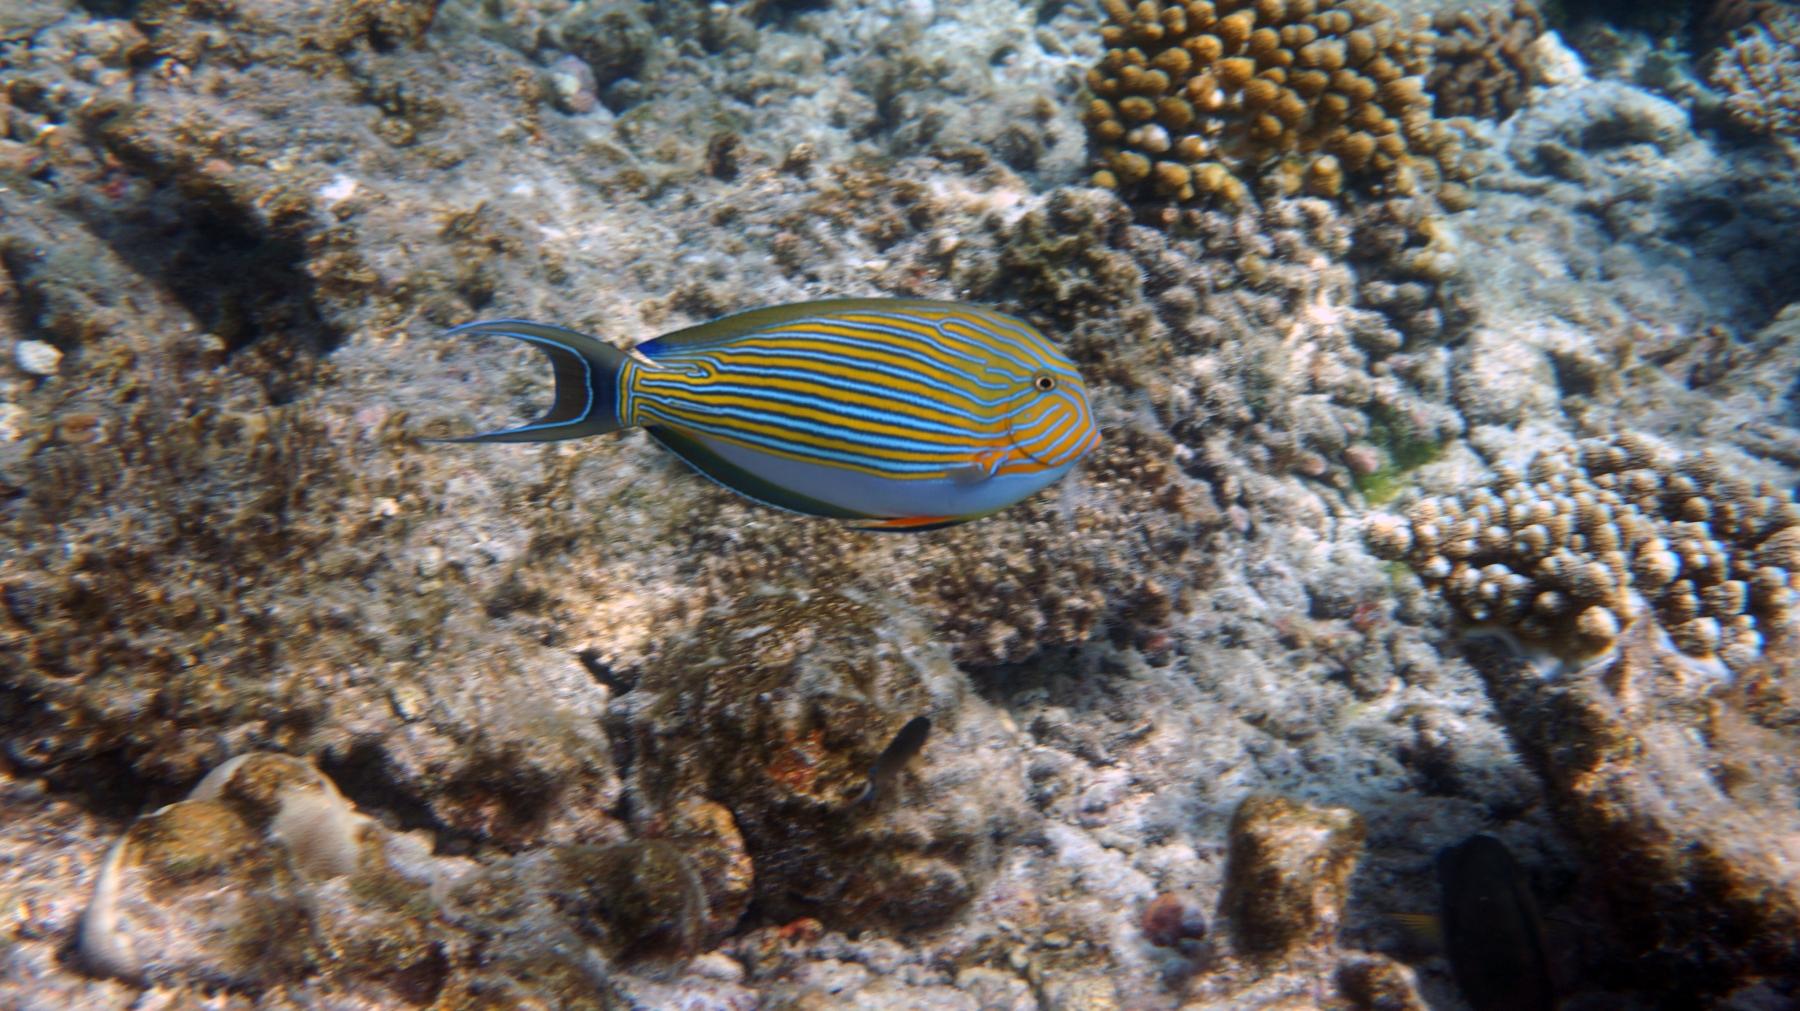 Acanthurus_lineatus_002_C_Peces-Cirujano_L_Maldivas_U_Sebas_02072015